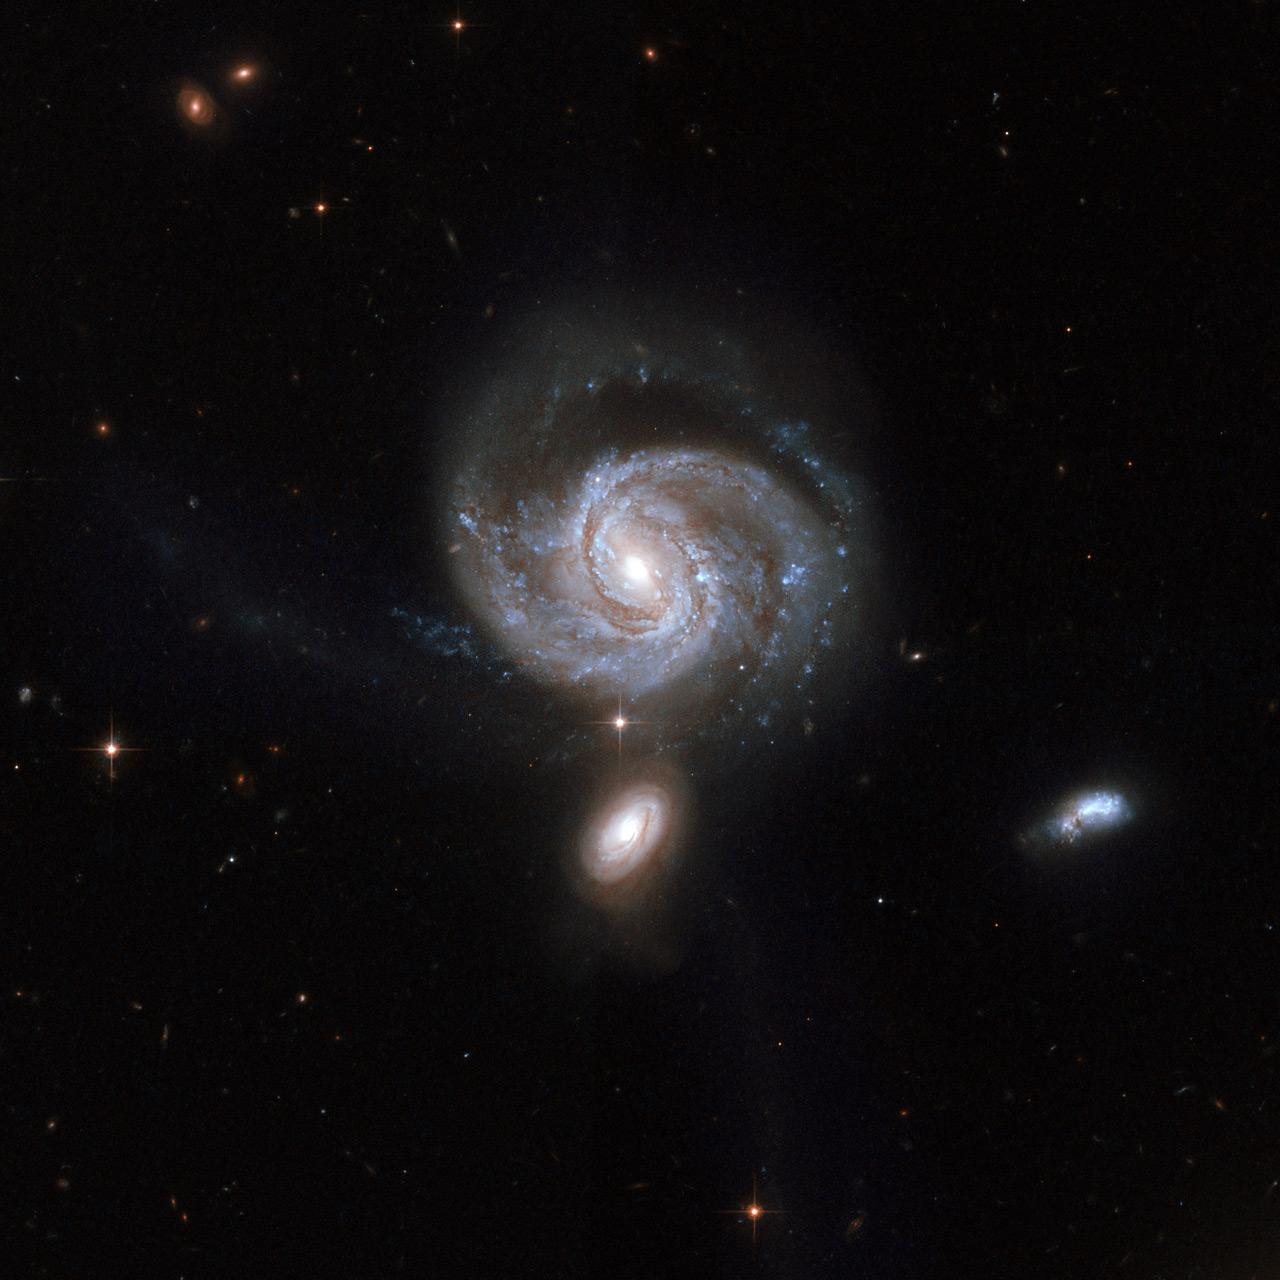 june-10-2019-galaxy-ngc-7674.jpg